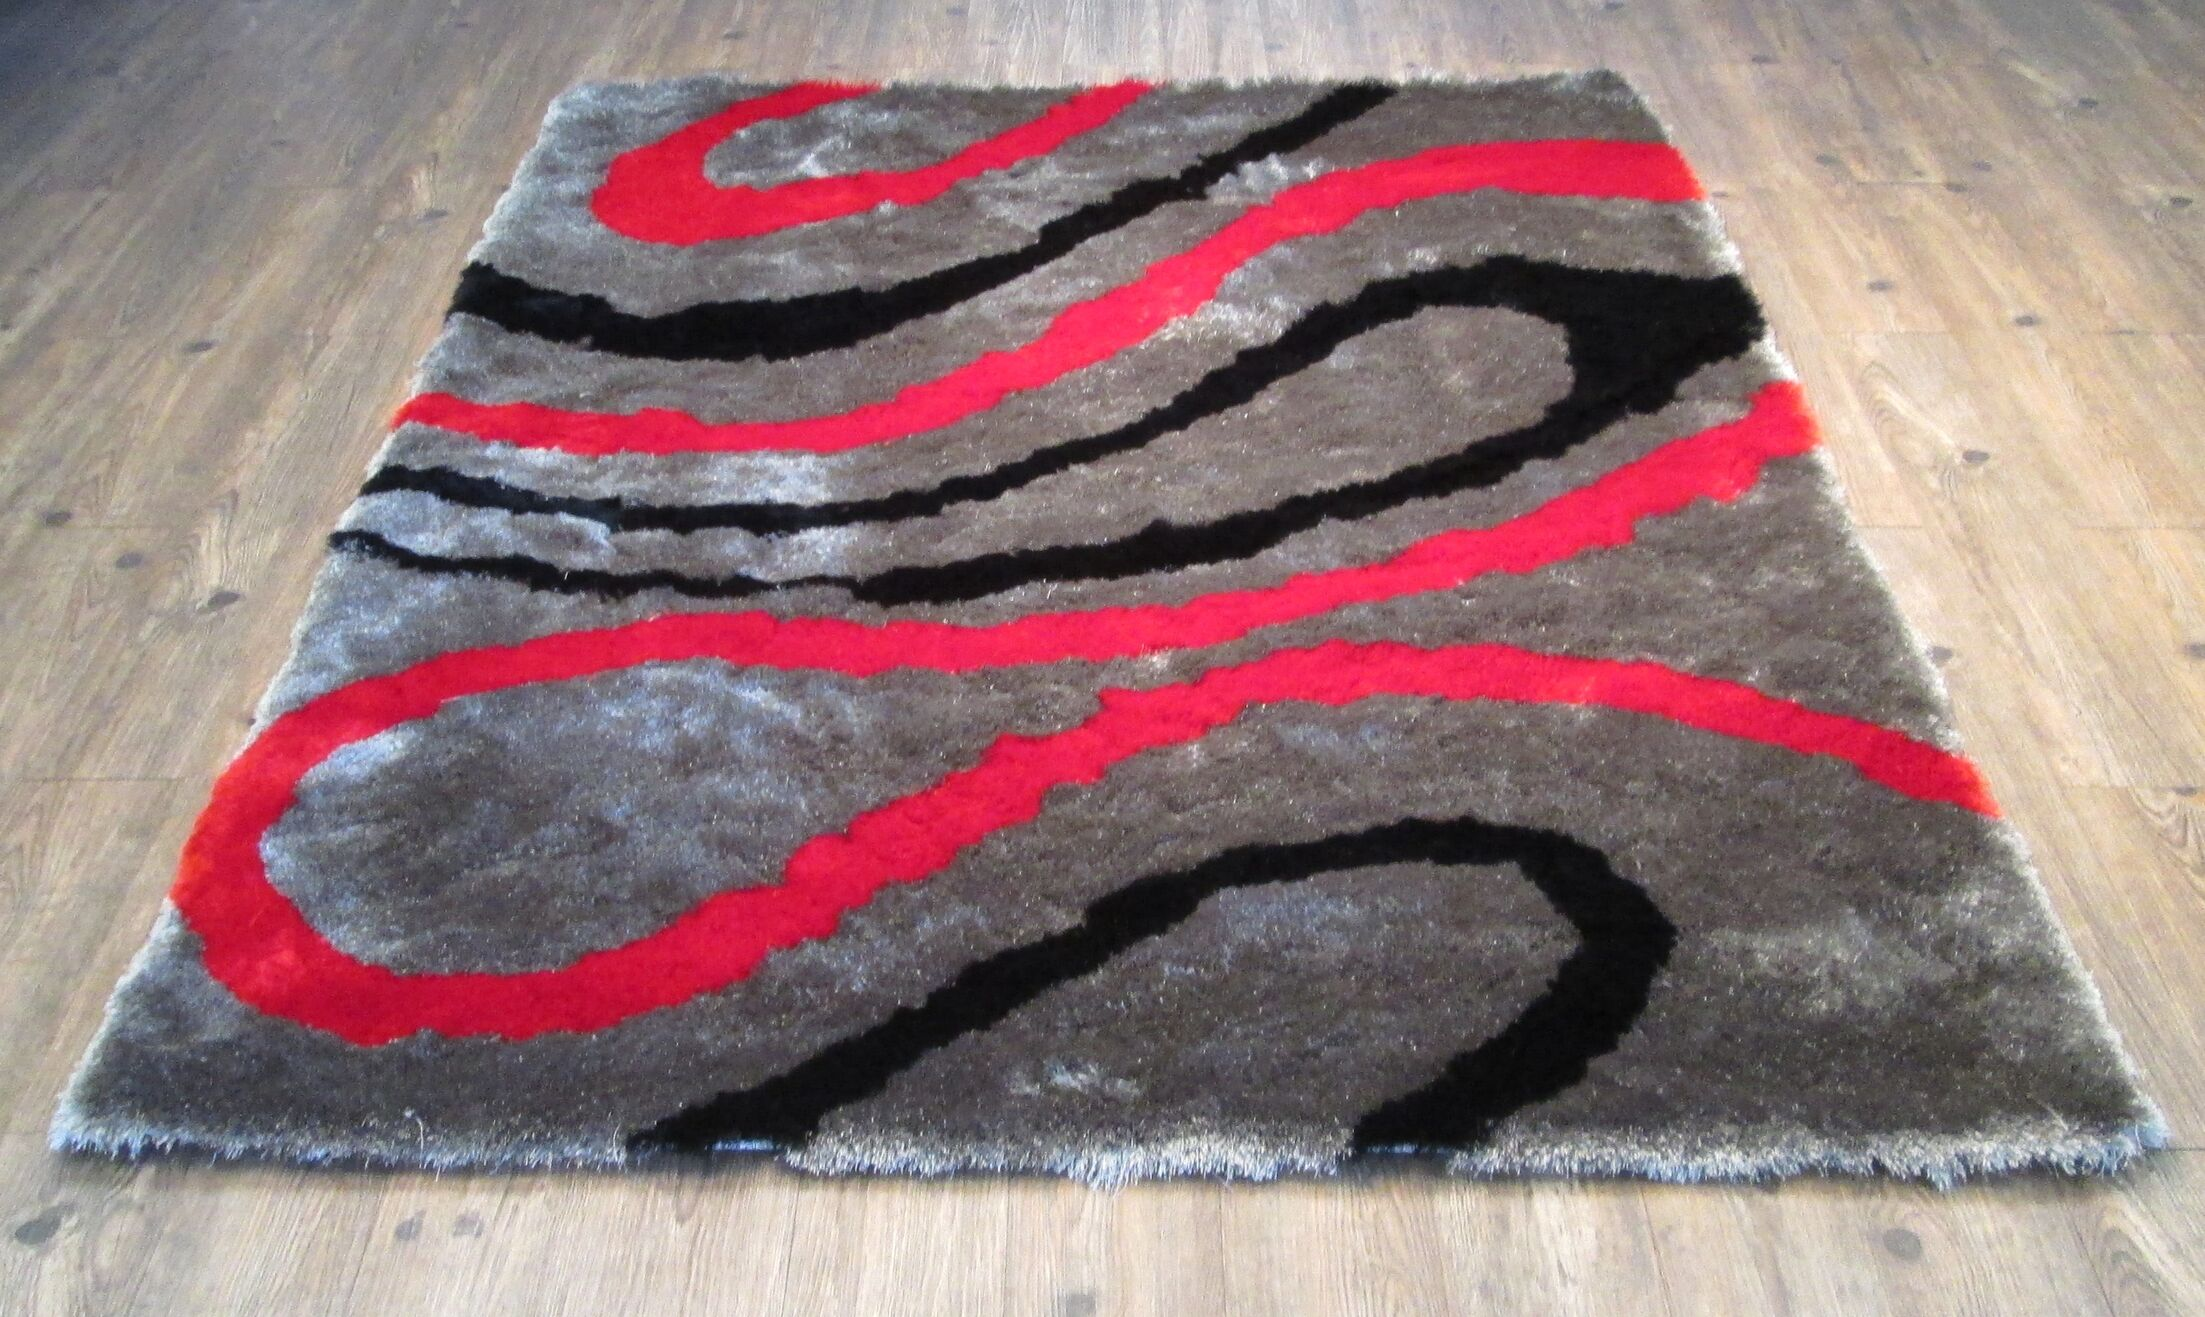 Cleavenger Modern Hand-Tufted Black/Red Area Rug Rug Size: Rectangle 7'6